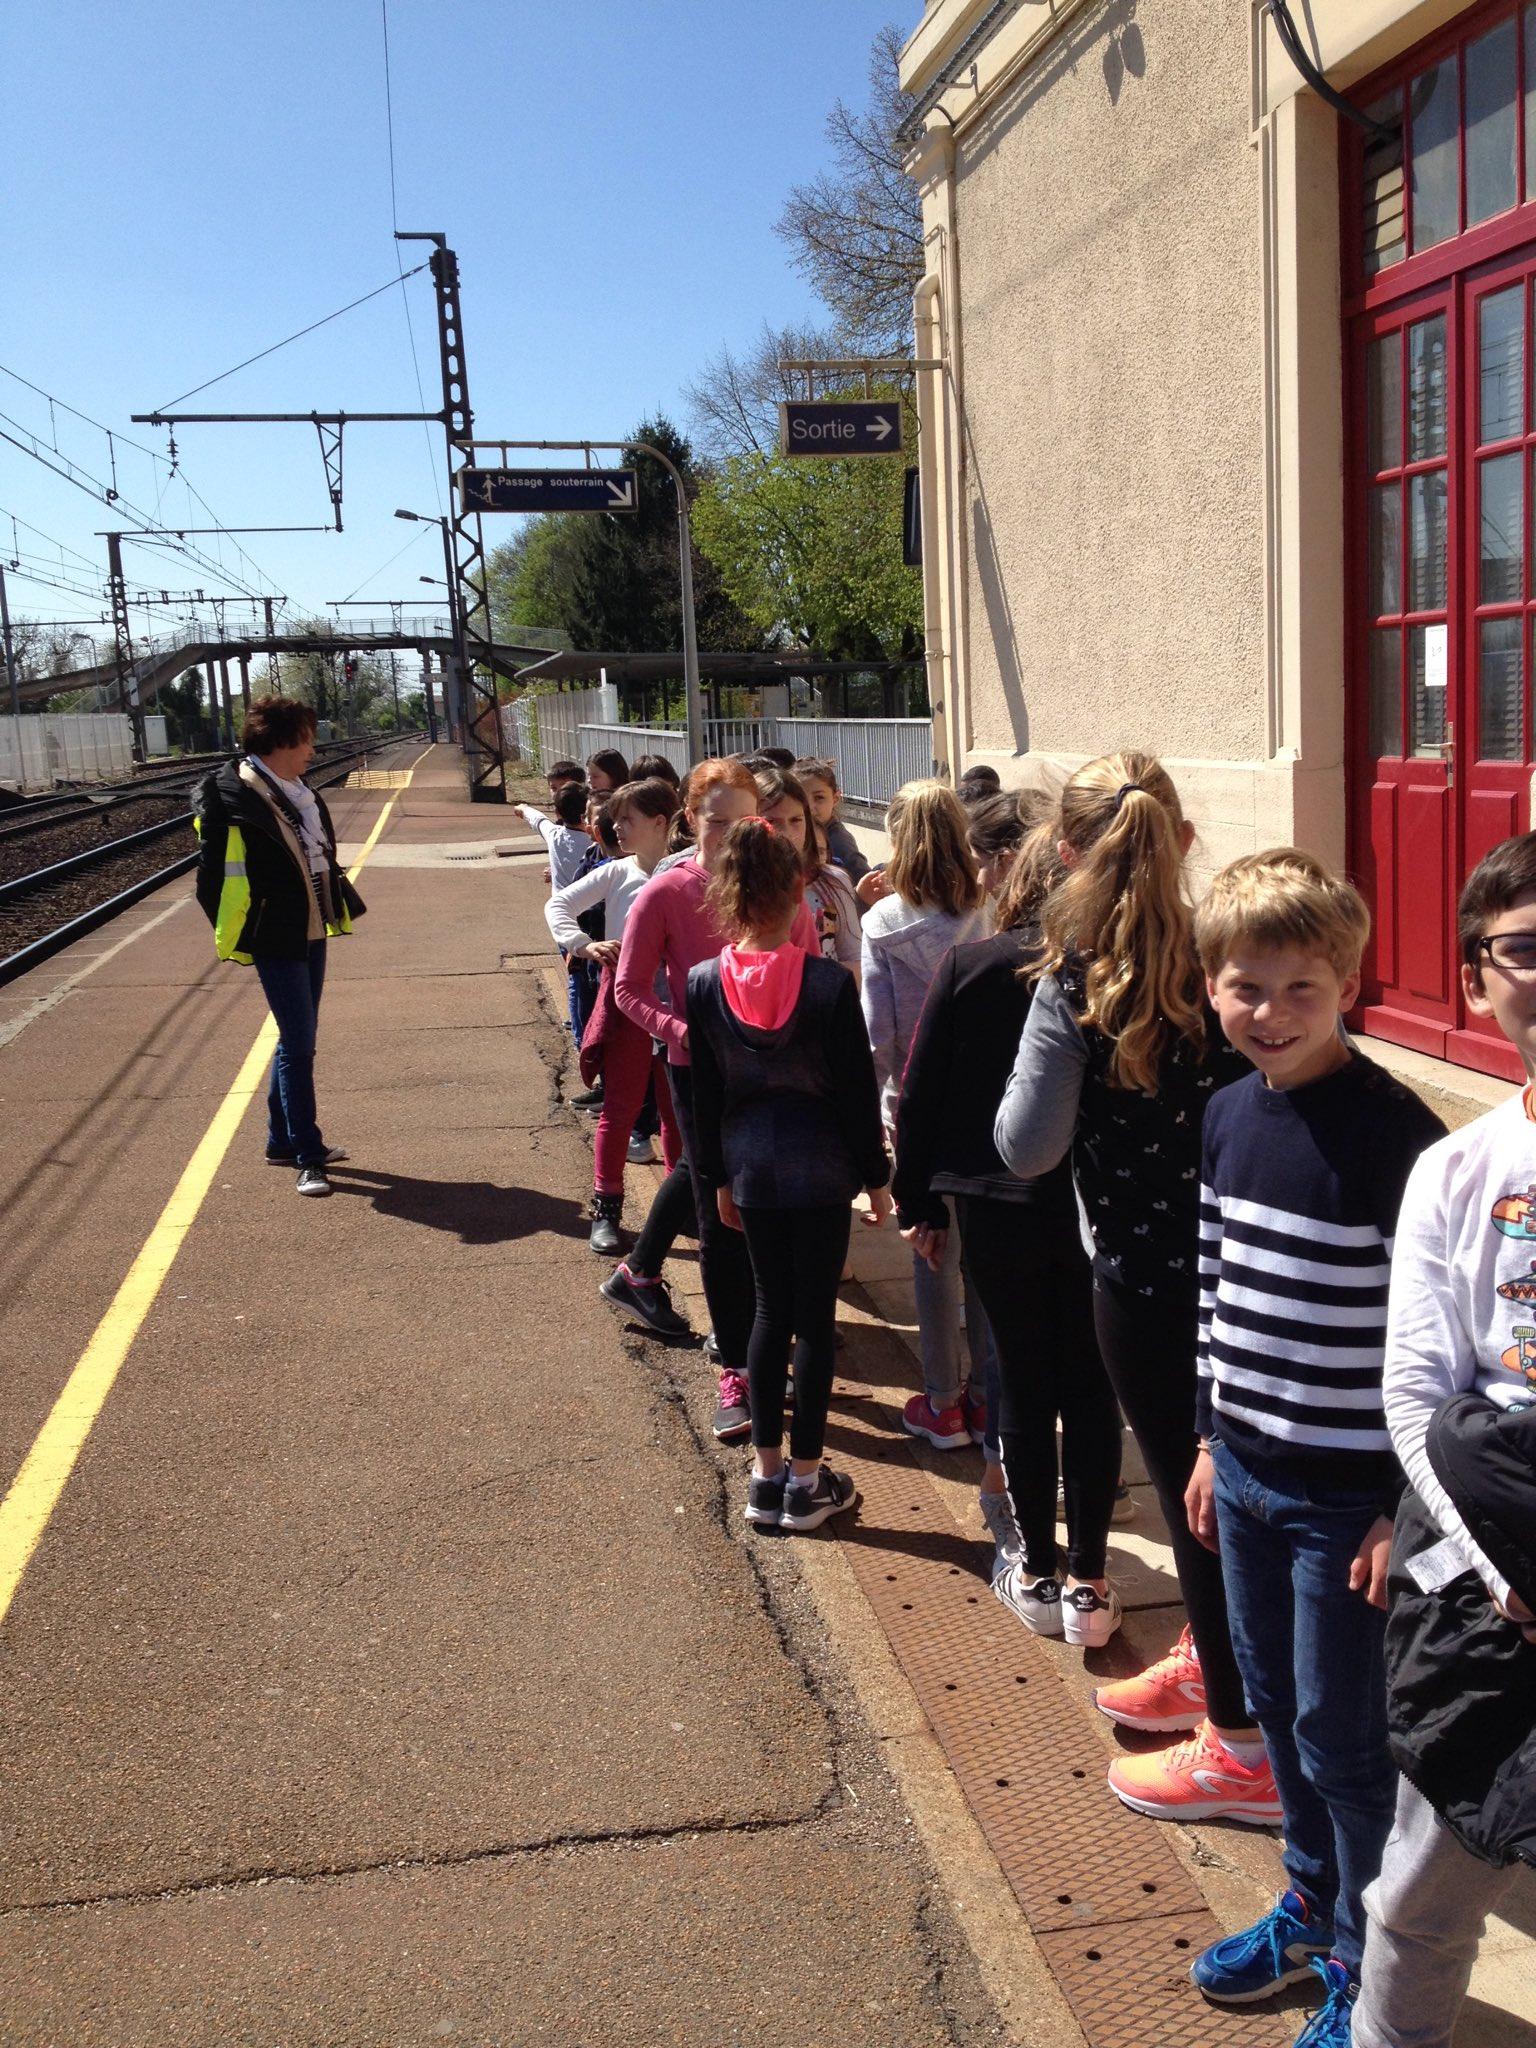 En attente du train pour Dijon https://t.co/Elli3oBKHT